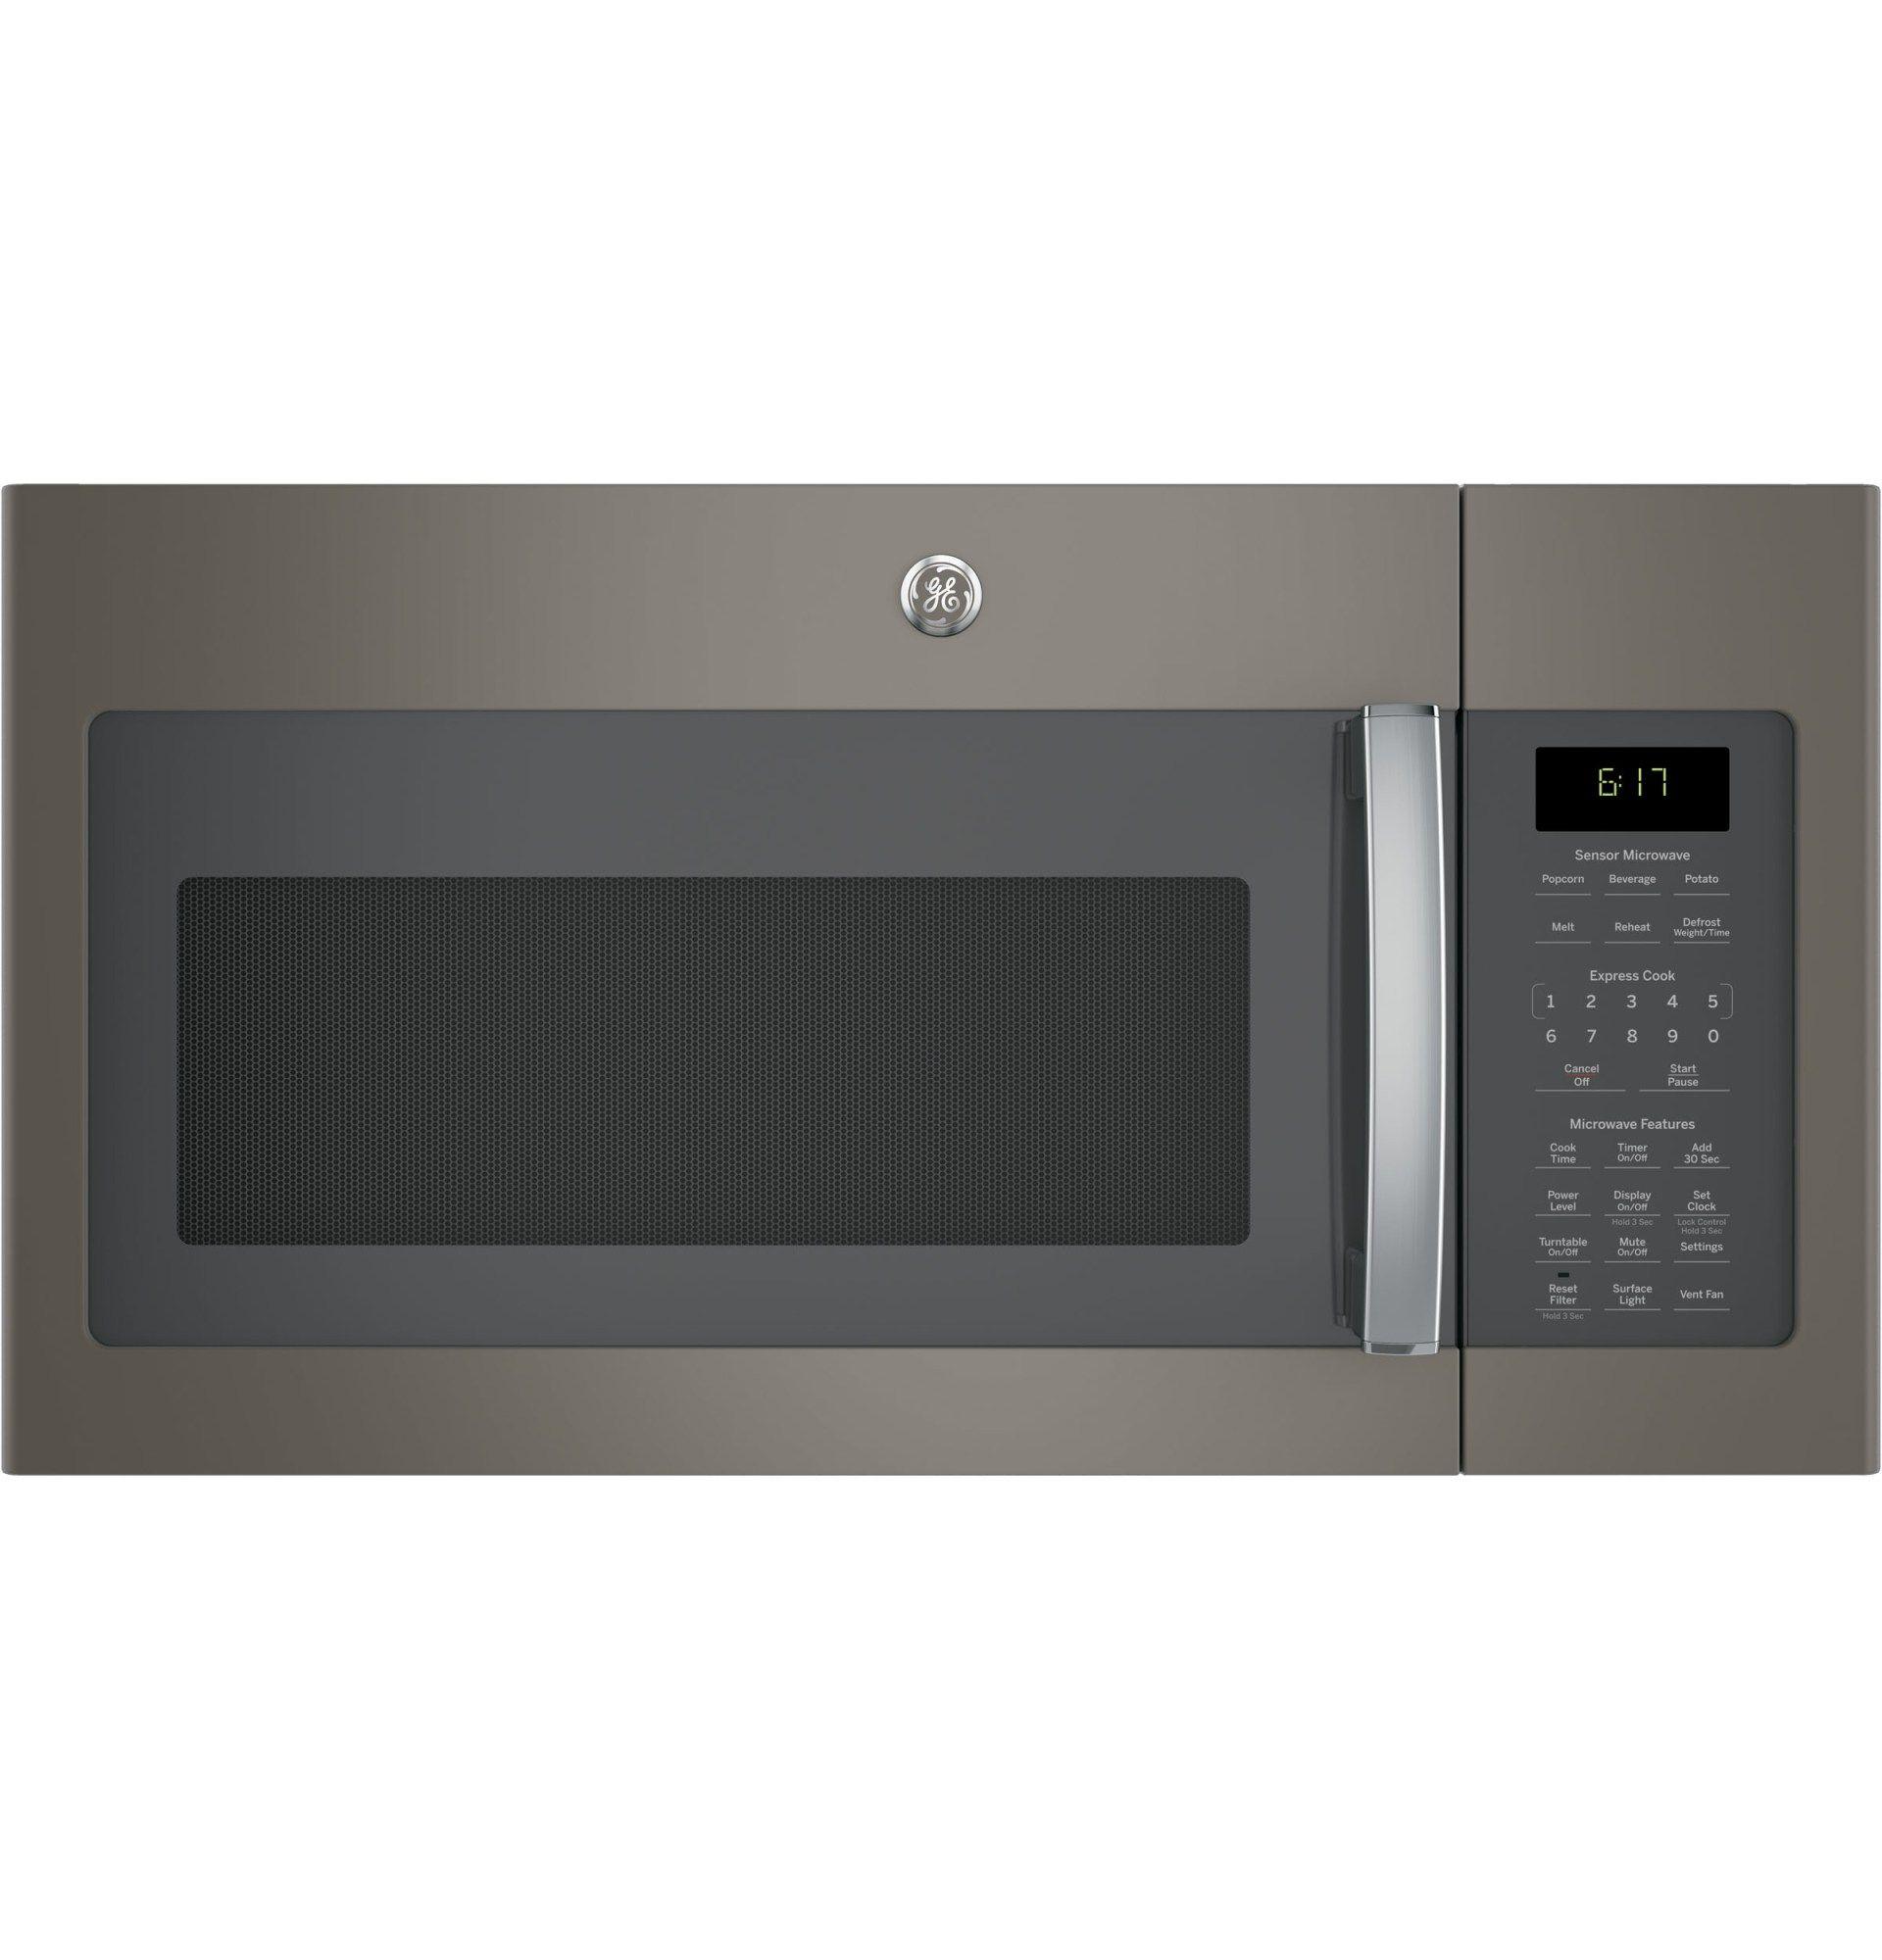 Ge Jvm6175ekes 1 7 Cu Ft Over The Range Sensor Microwave Oven Slate Slate Over The Range Microwaves Range Microwave Ge Appliances